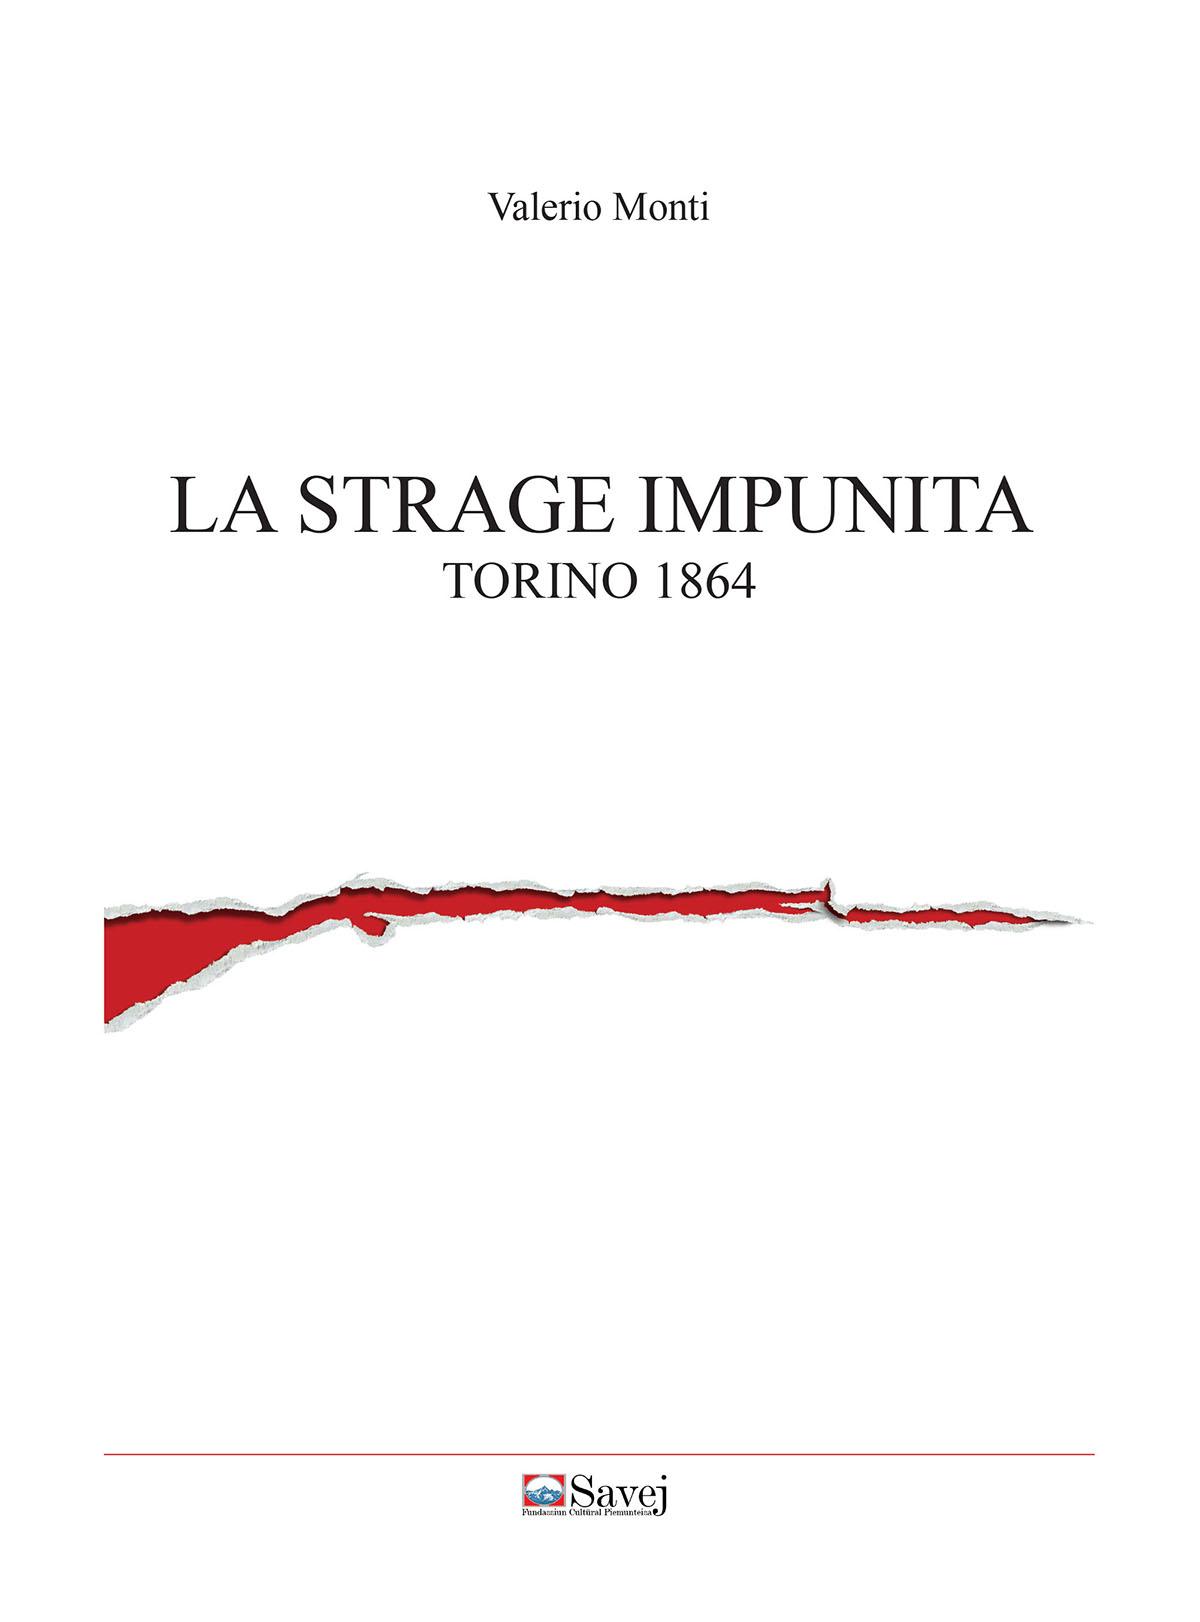 Copertina_strage_impunita_1200px